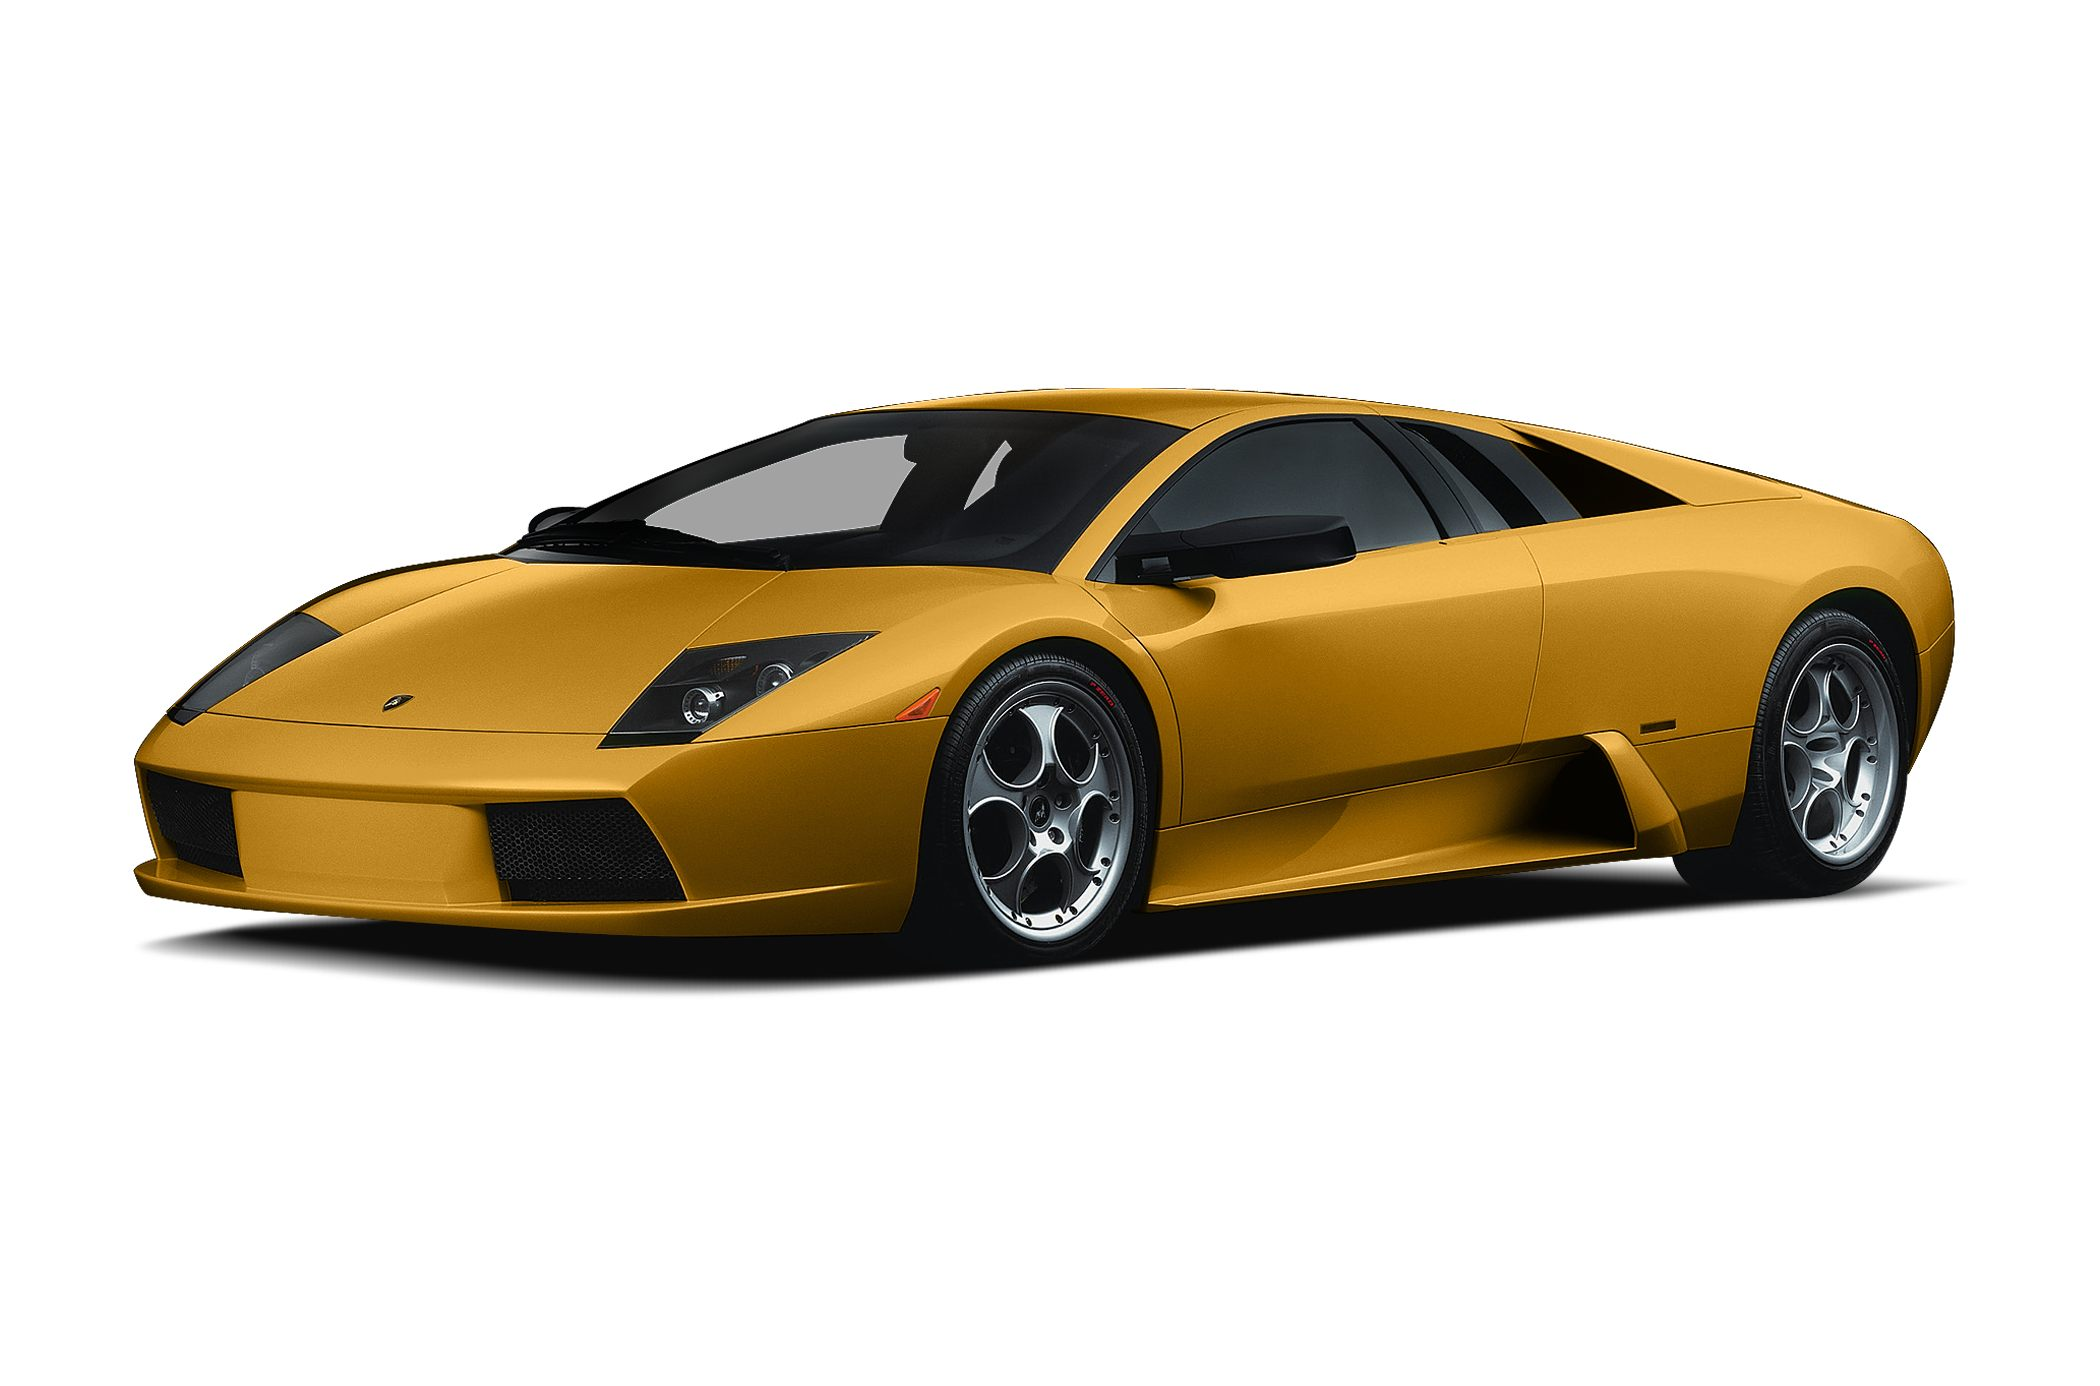 2007 Lamborghini Murcielago Lp640 2dr Coupe Pricing And Options